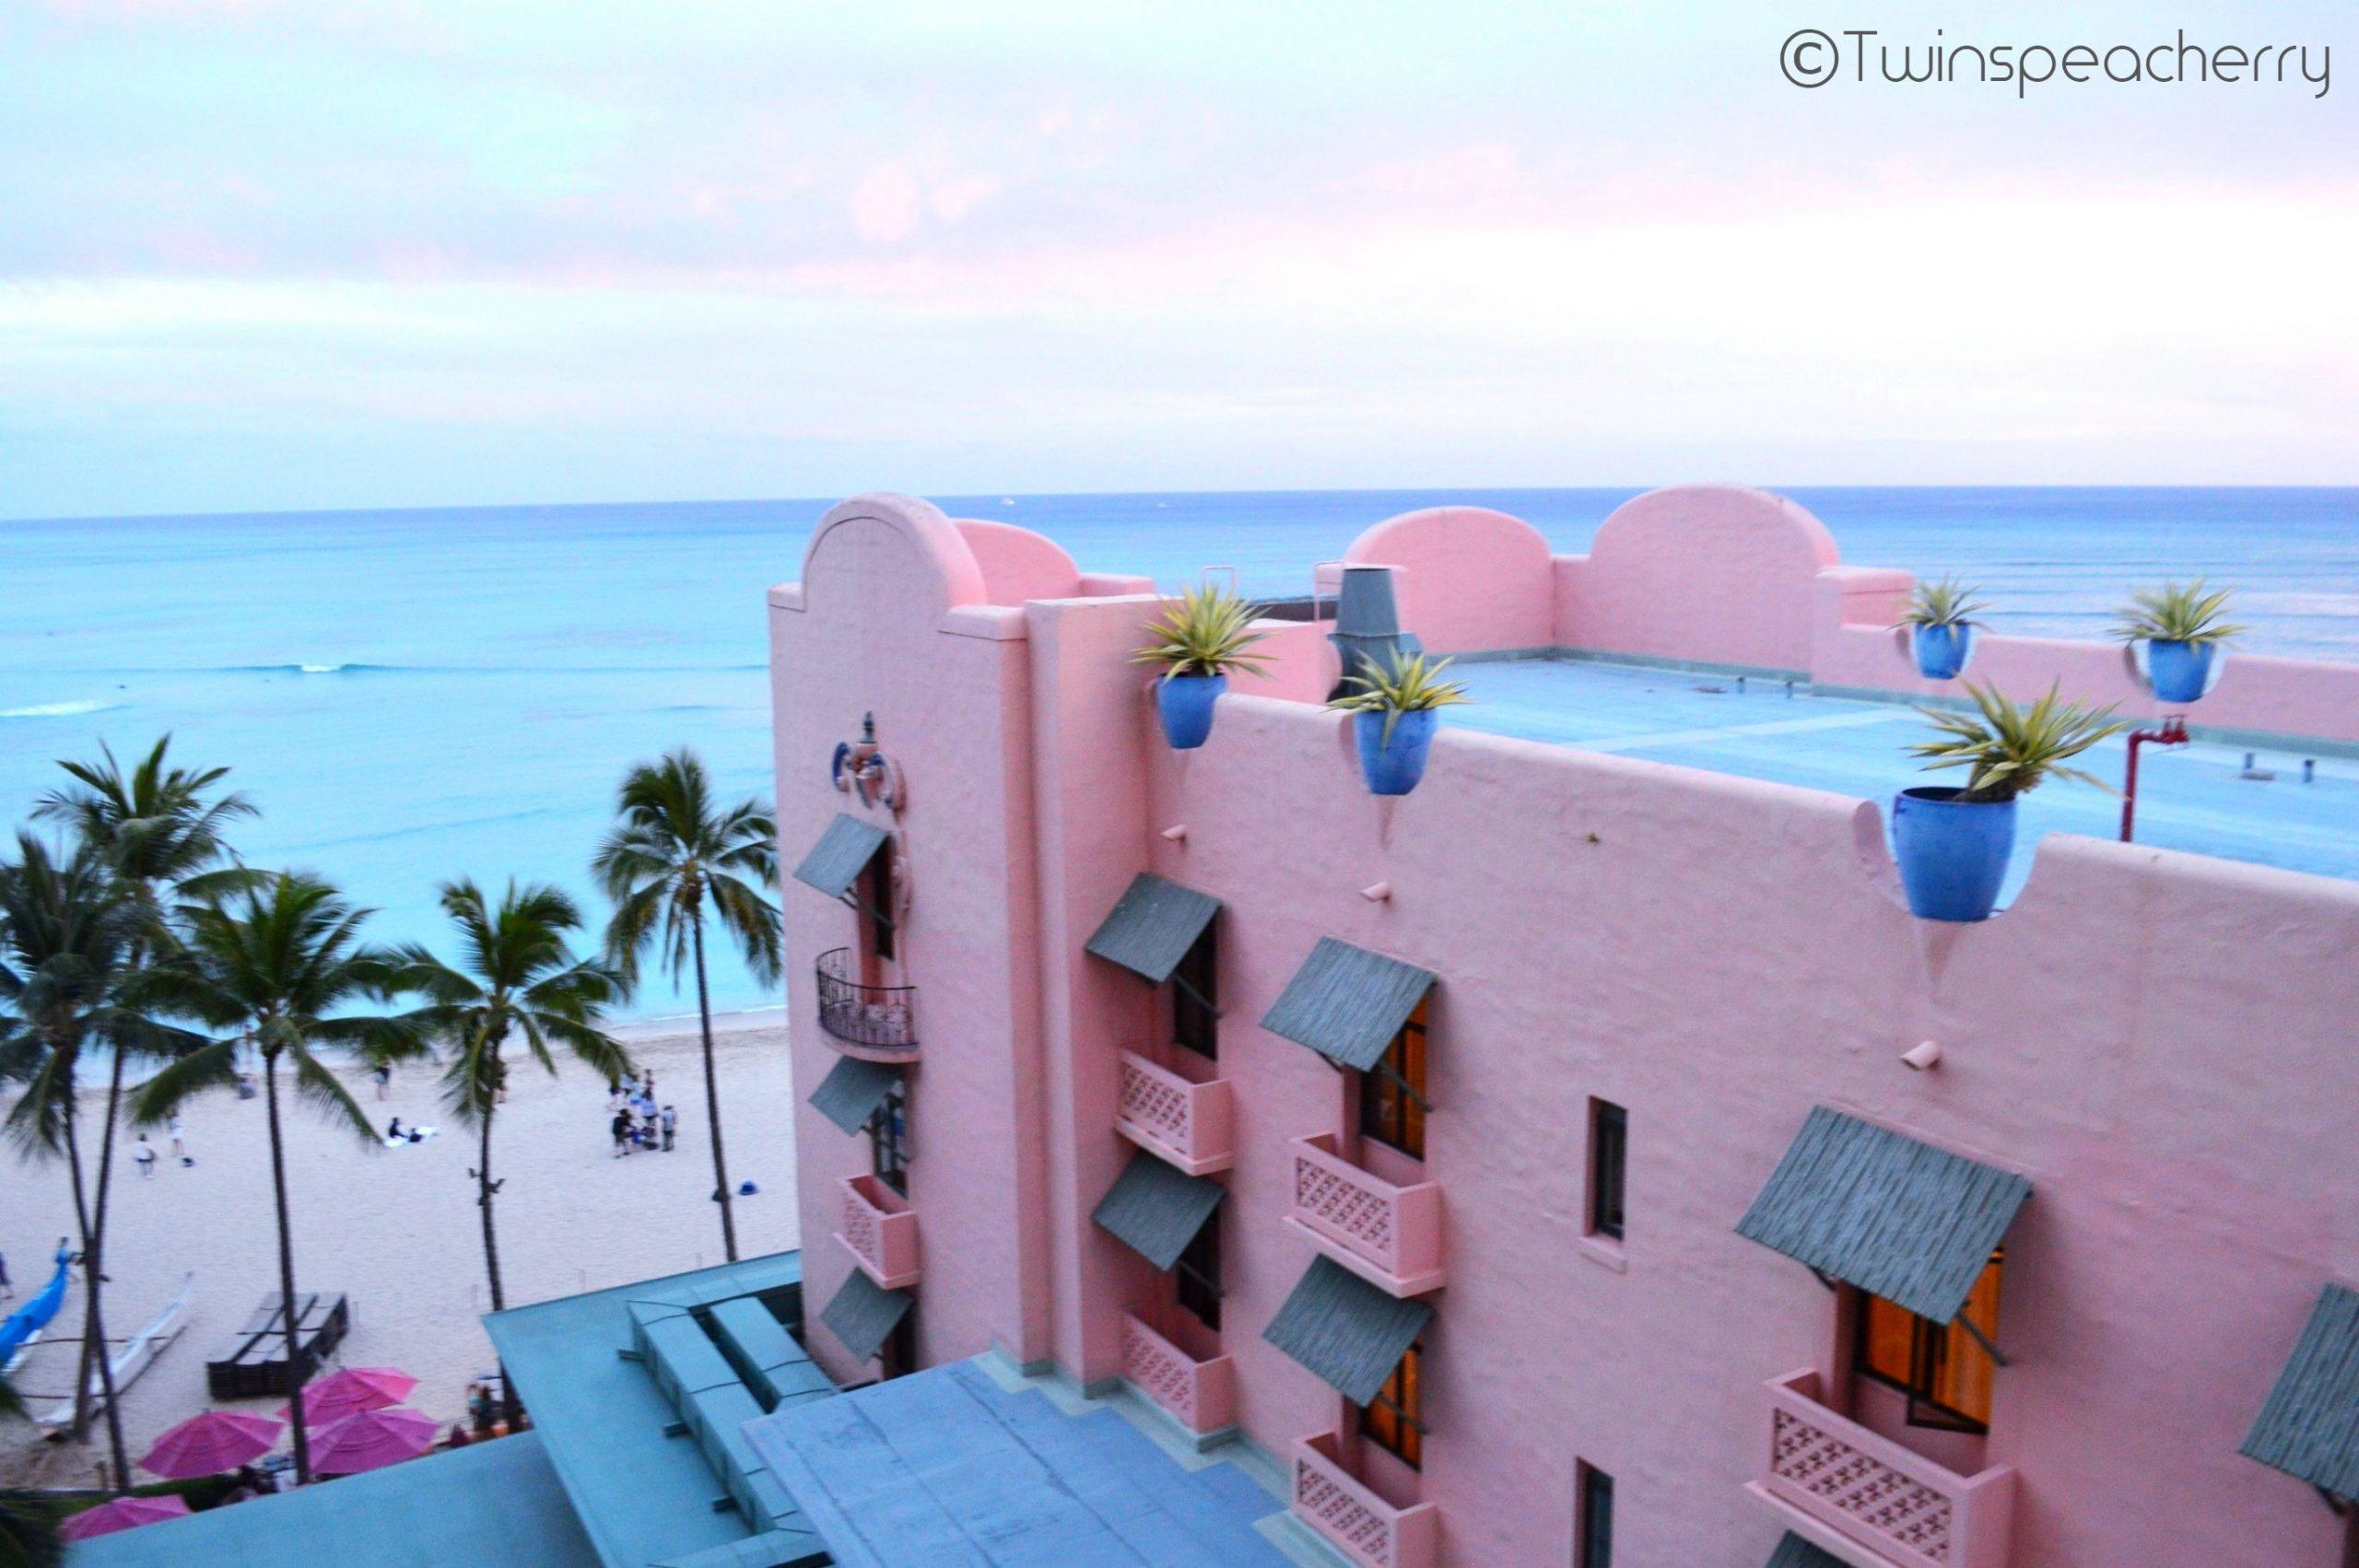 Royal Hawaiian(ローヤル・ハワイアン)ピンクパレス 最高の眺望!♯妄想旅行 ♯脳内旅行|幼児(双子2歳)とハワイ オアフ島 旅行